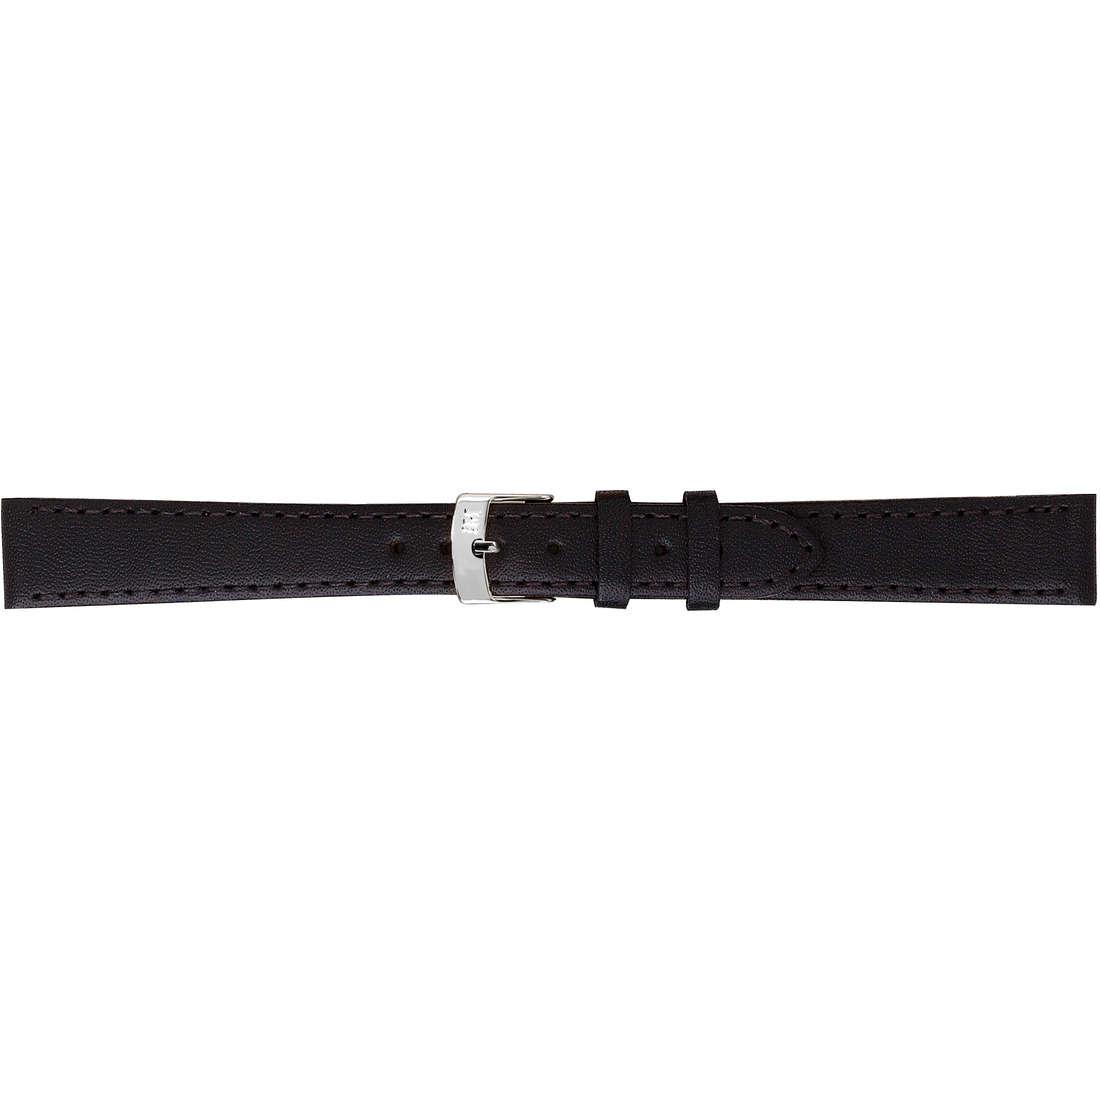 watch watch bands watch straps man Morellato Performance A01X2619875019CR12